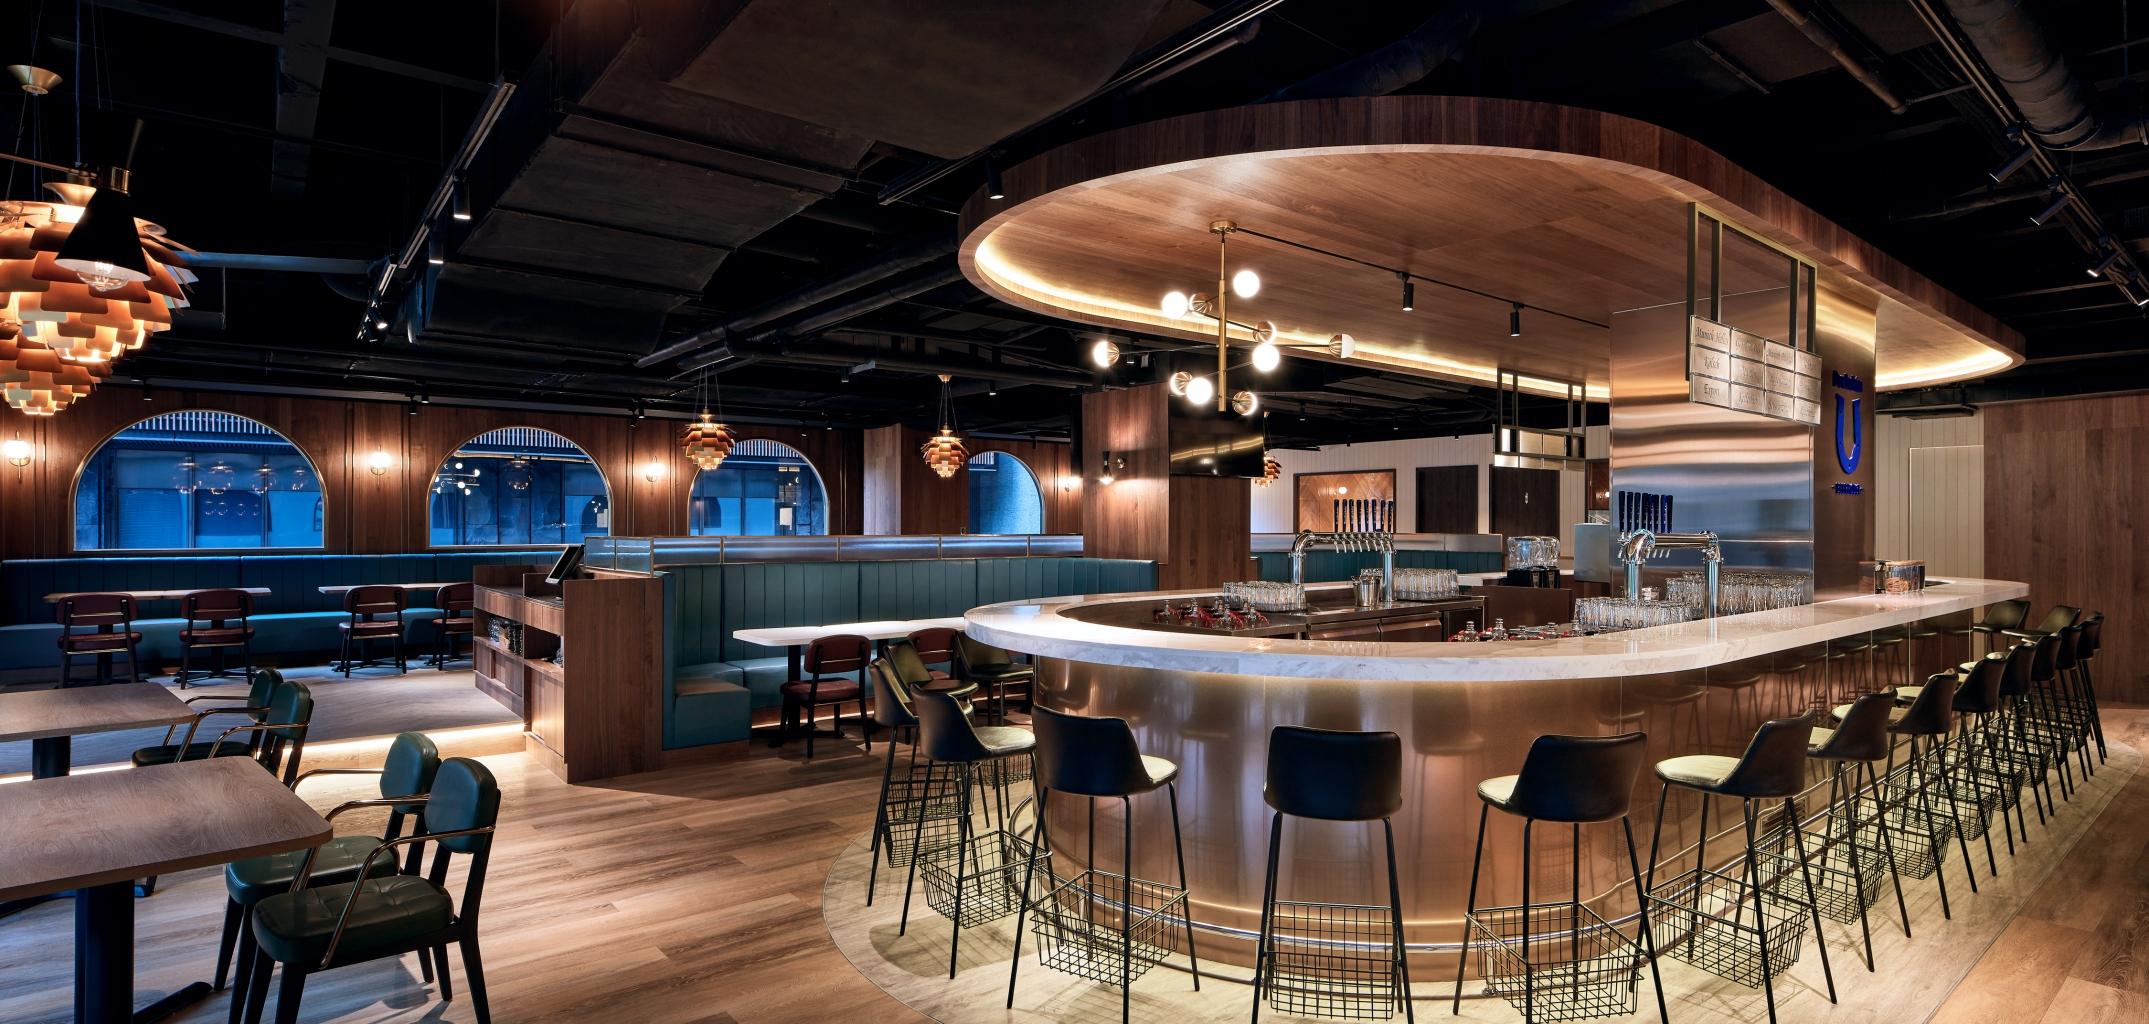 Buckskin Beerhouse 南京店延續松仁旗艦店的歐風裝潢,保留各項「啤酒」元素